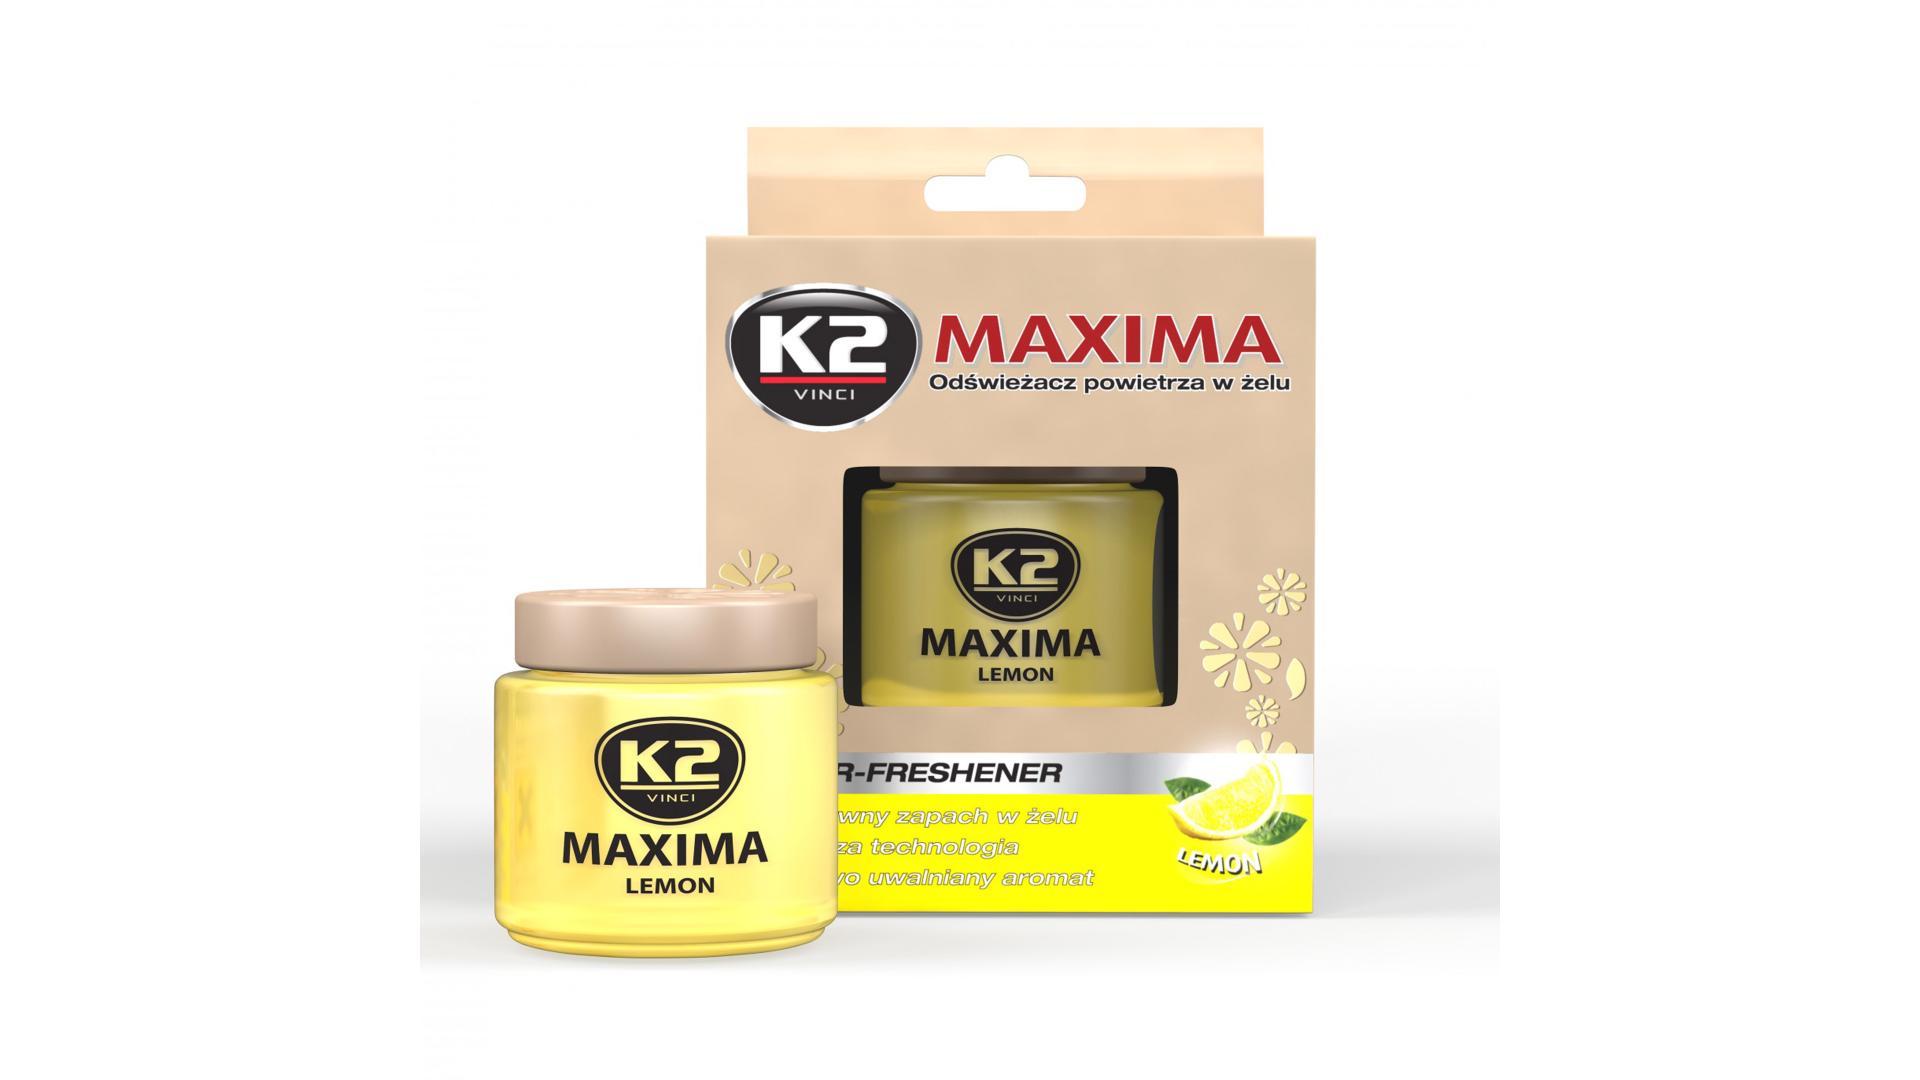 K2 Maxima Lemon